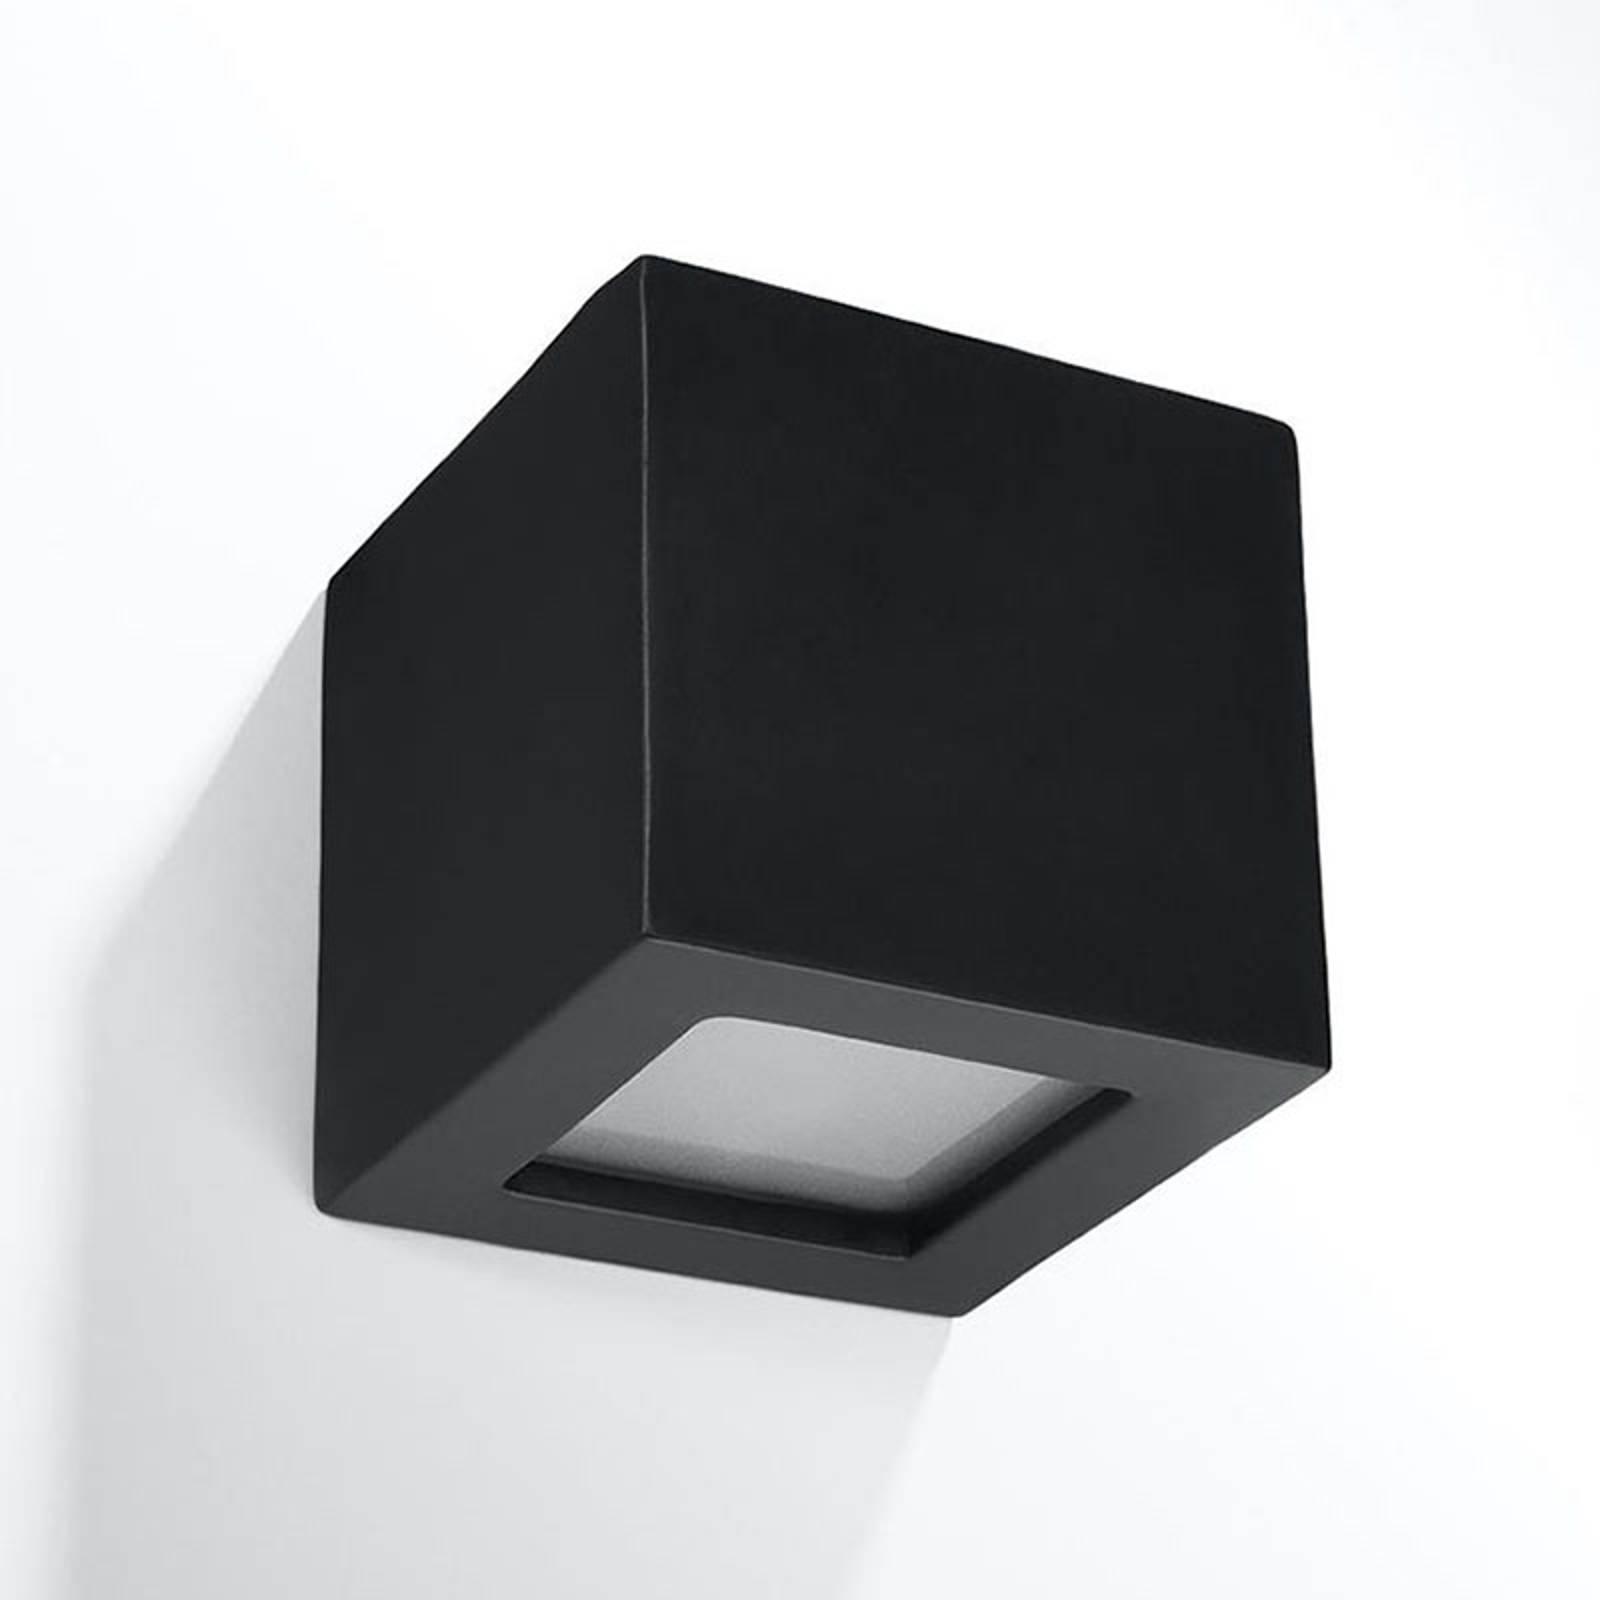 Wandleuchte Top aus Keramik, up/down, schwarz